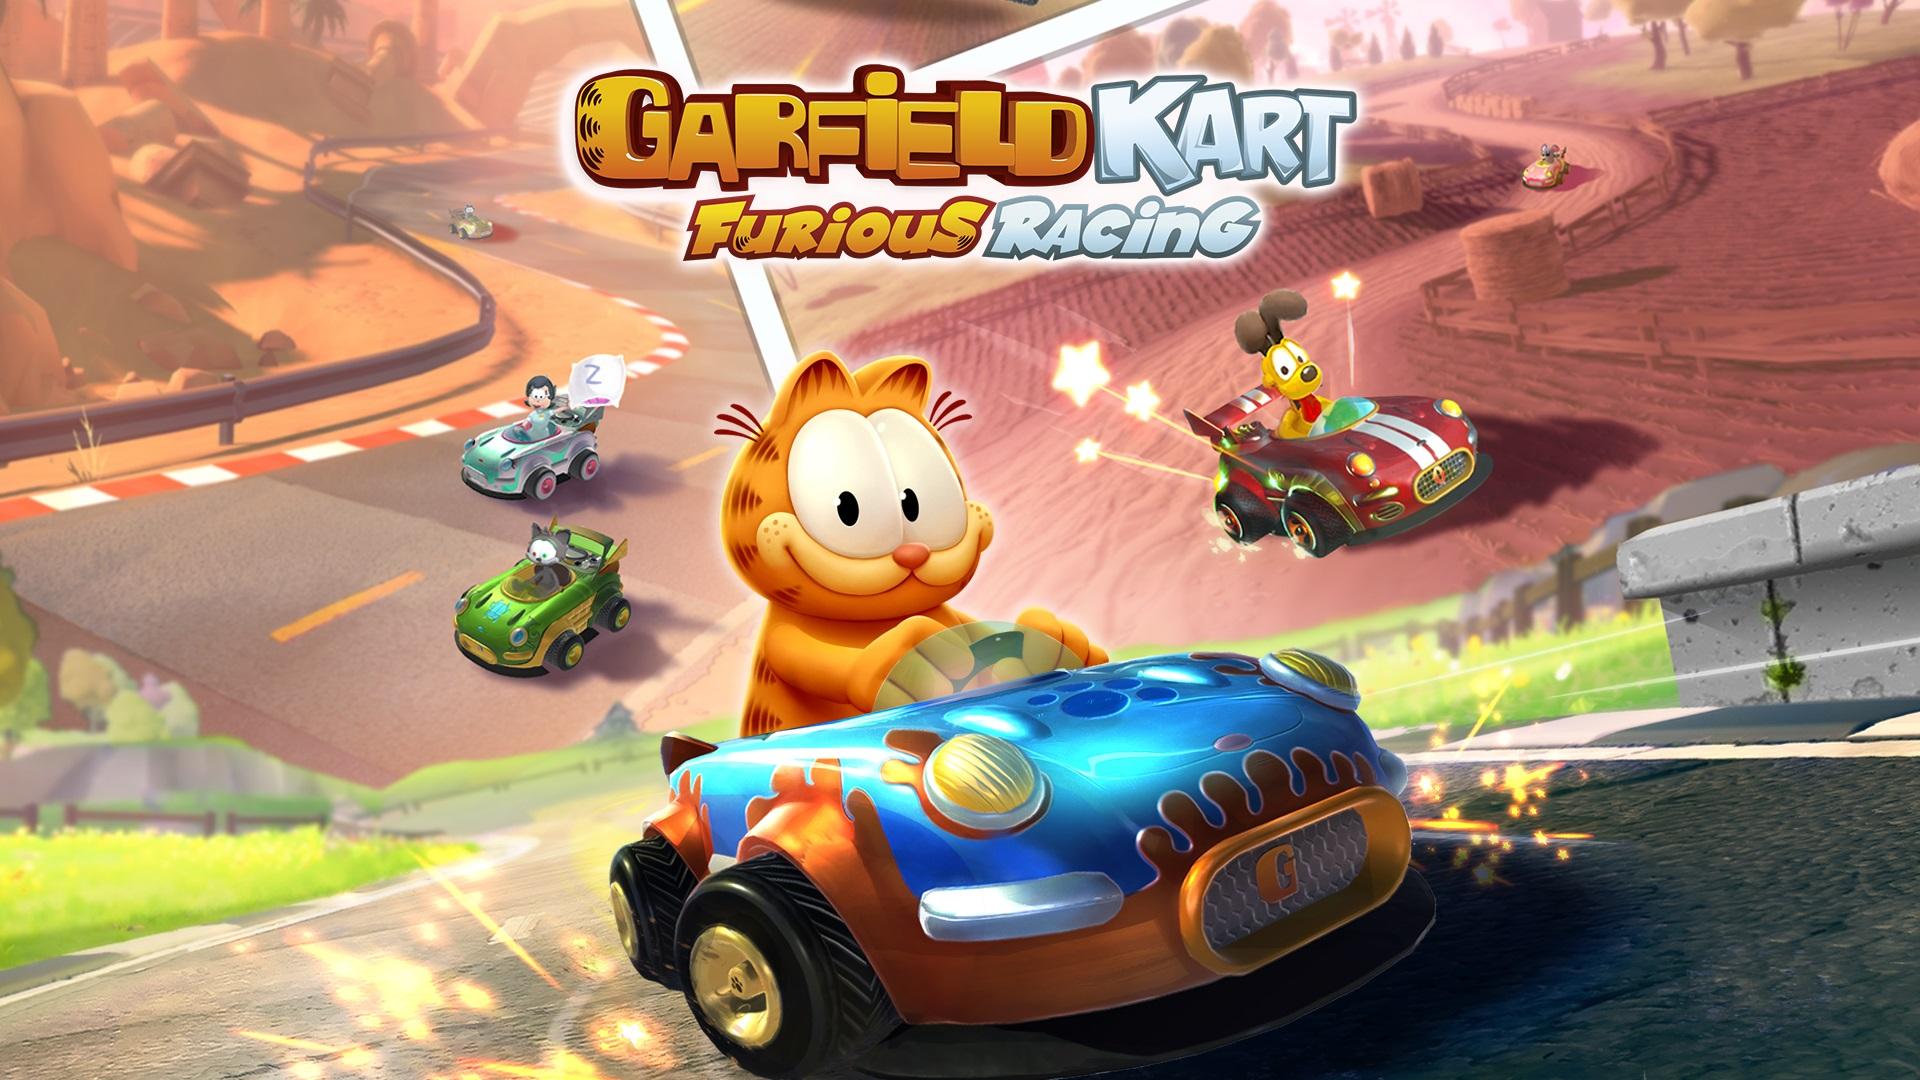 Nintendo Switch Digital Sale - Garfield Kart Furious Racing $11.99, SUPERHOT $14.99, Jamestown+ $8.99, SpeedRunners $8.99 and more